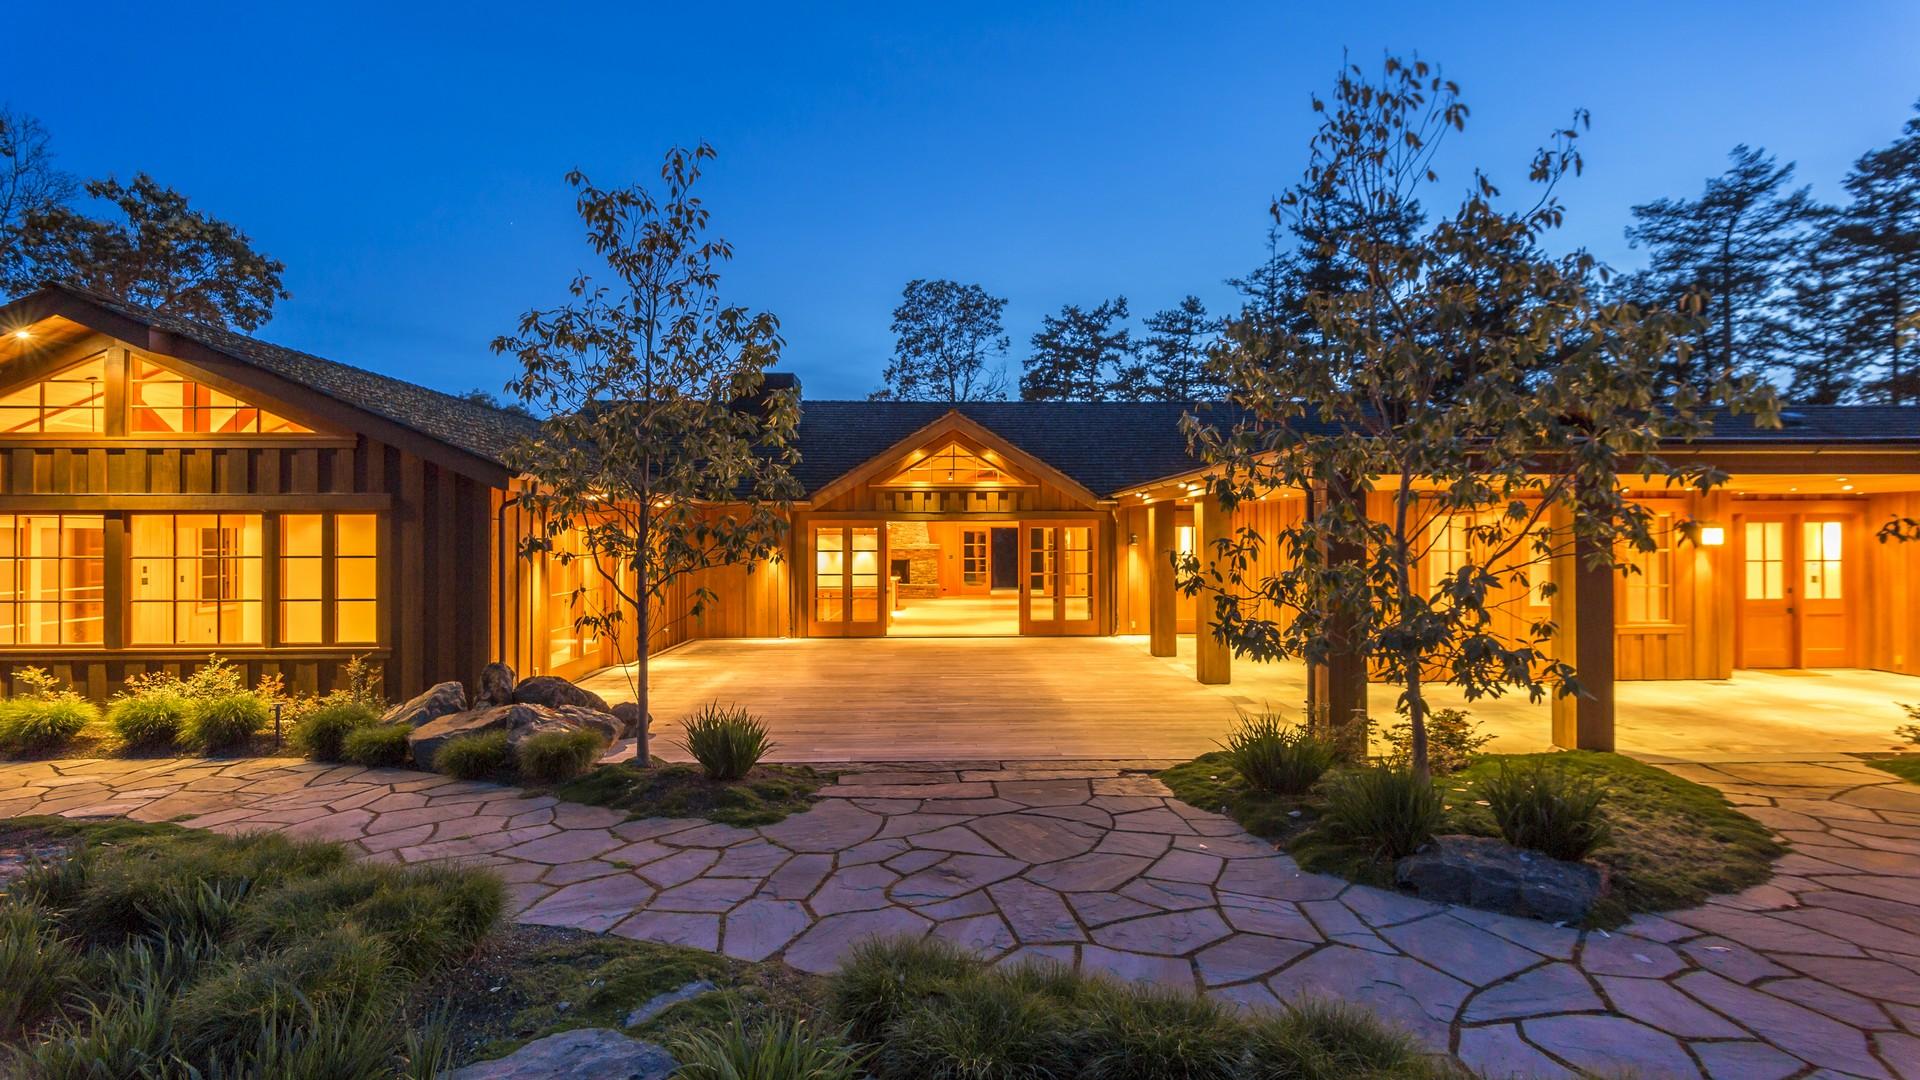 独户住宅 为 销售 在 Friday Harbor Estate 67 Roulac Lane 星期五港, 华盛顿州, 98250 美国